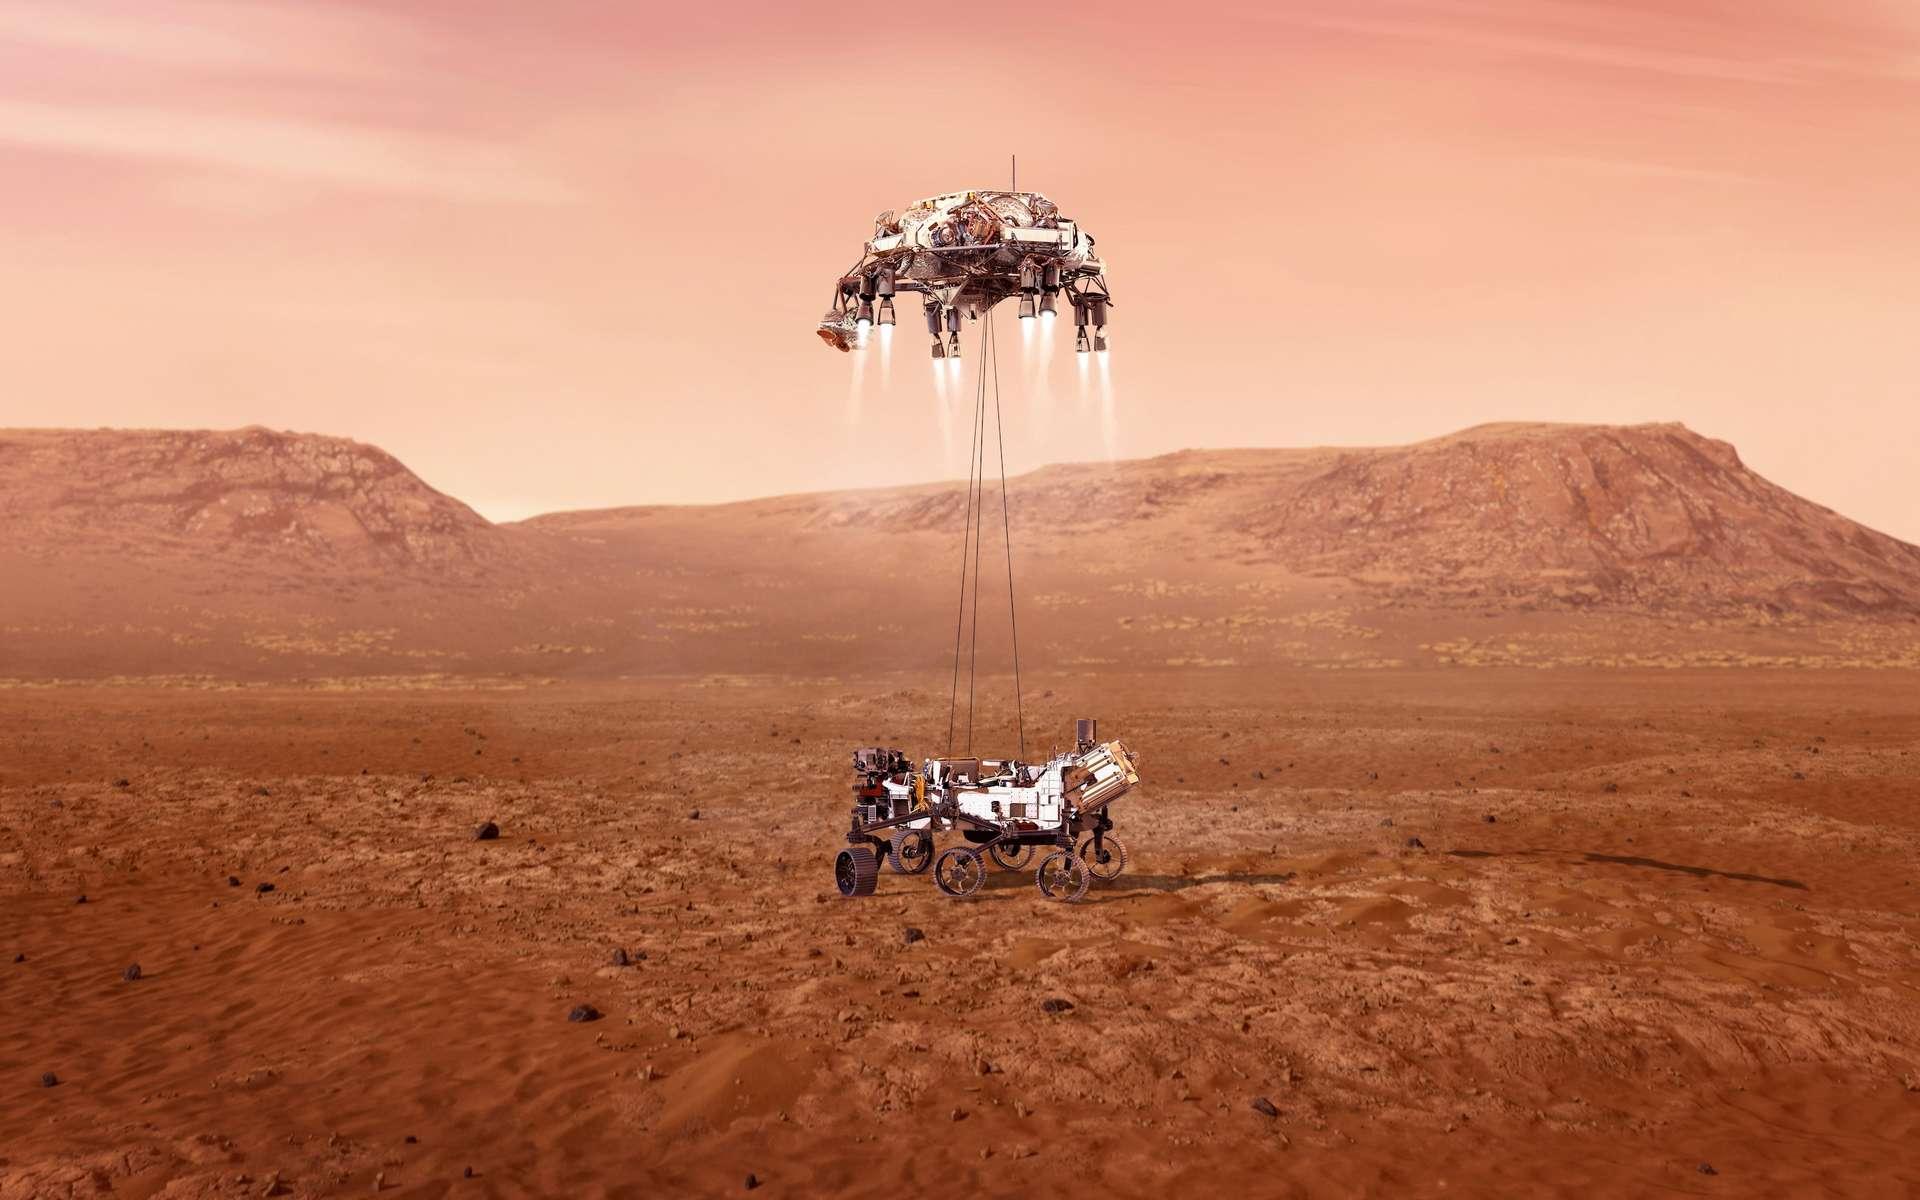 Perseverance, le rover de la Nasa, lors de sa descente vers Mars. © JPL-Caltech, Nasa